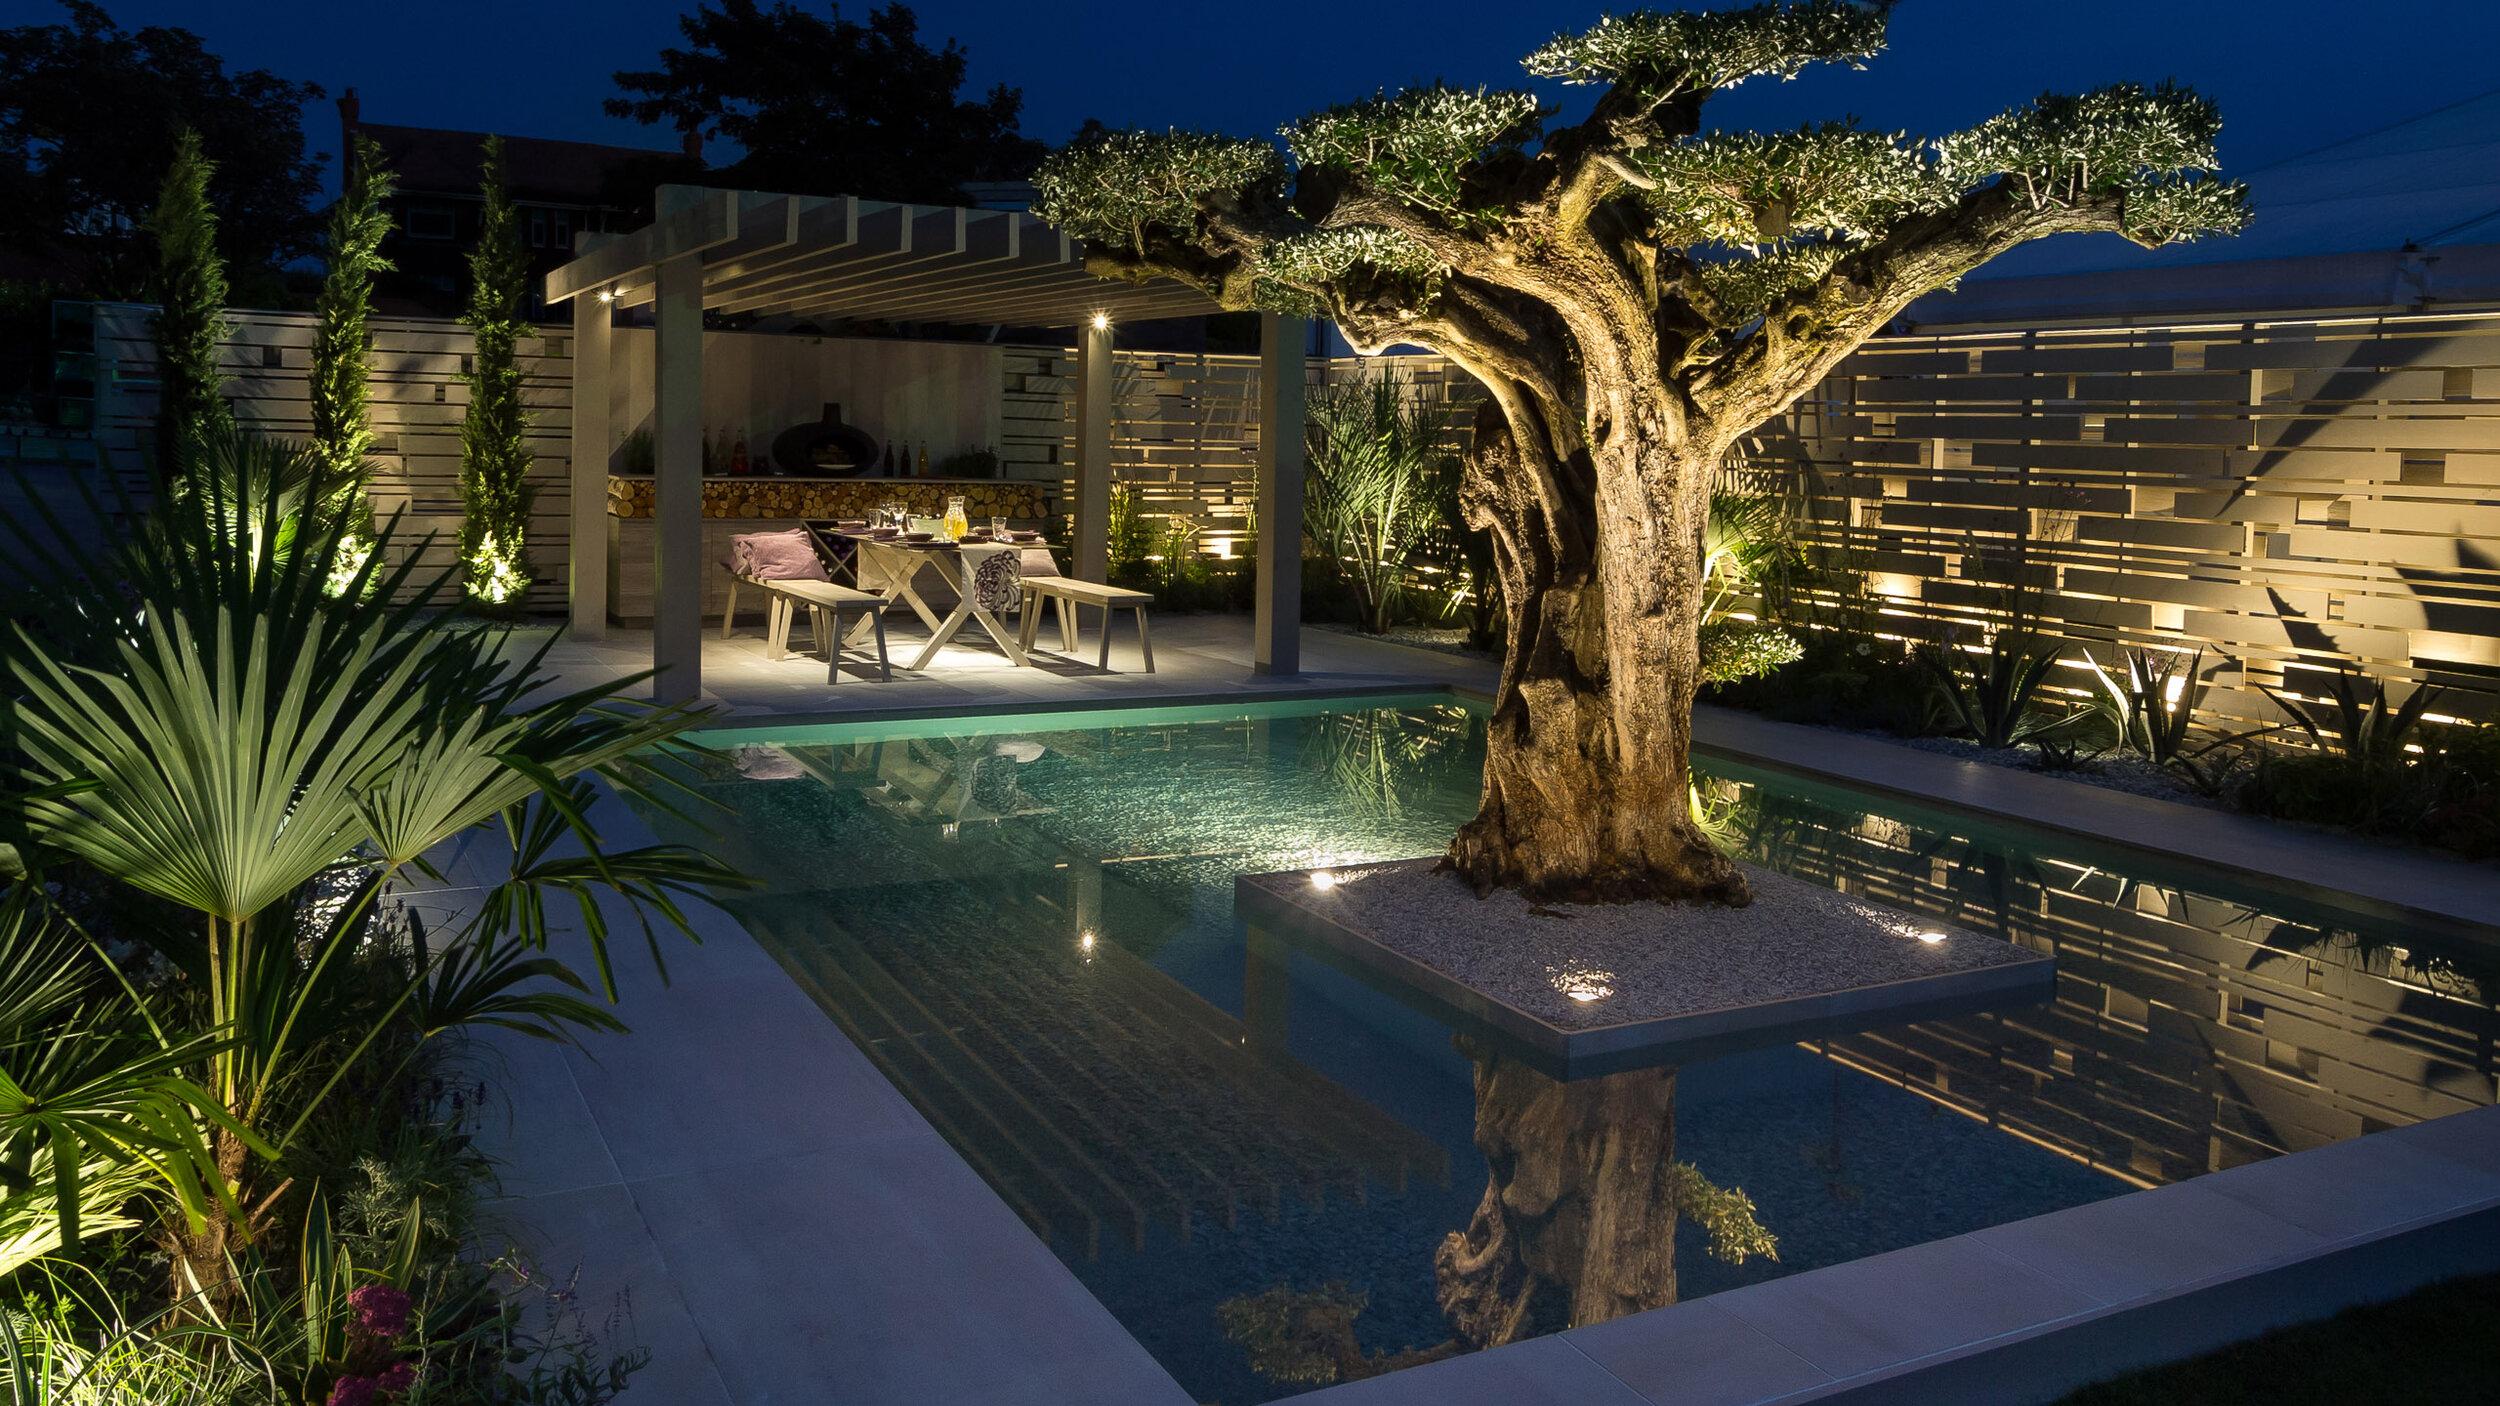 Cheshire Garden Designer and Landscaper: Kirman Design